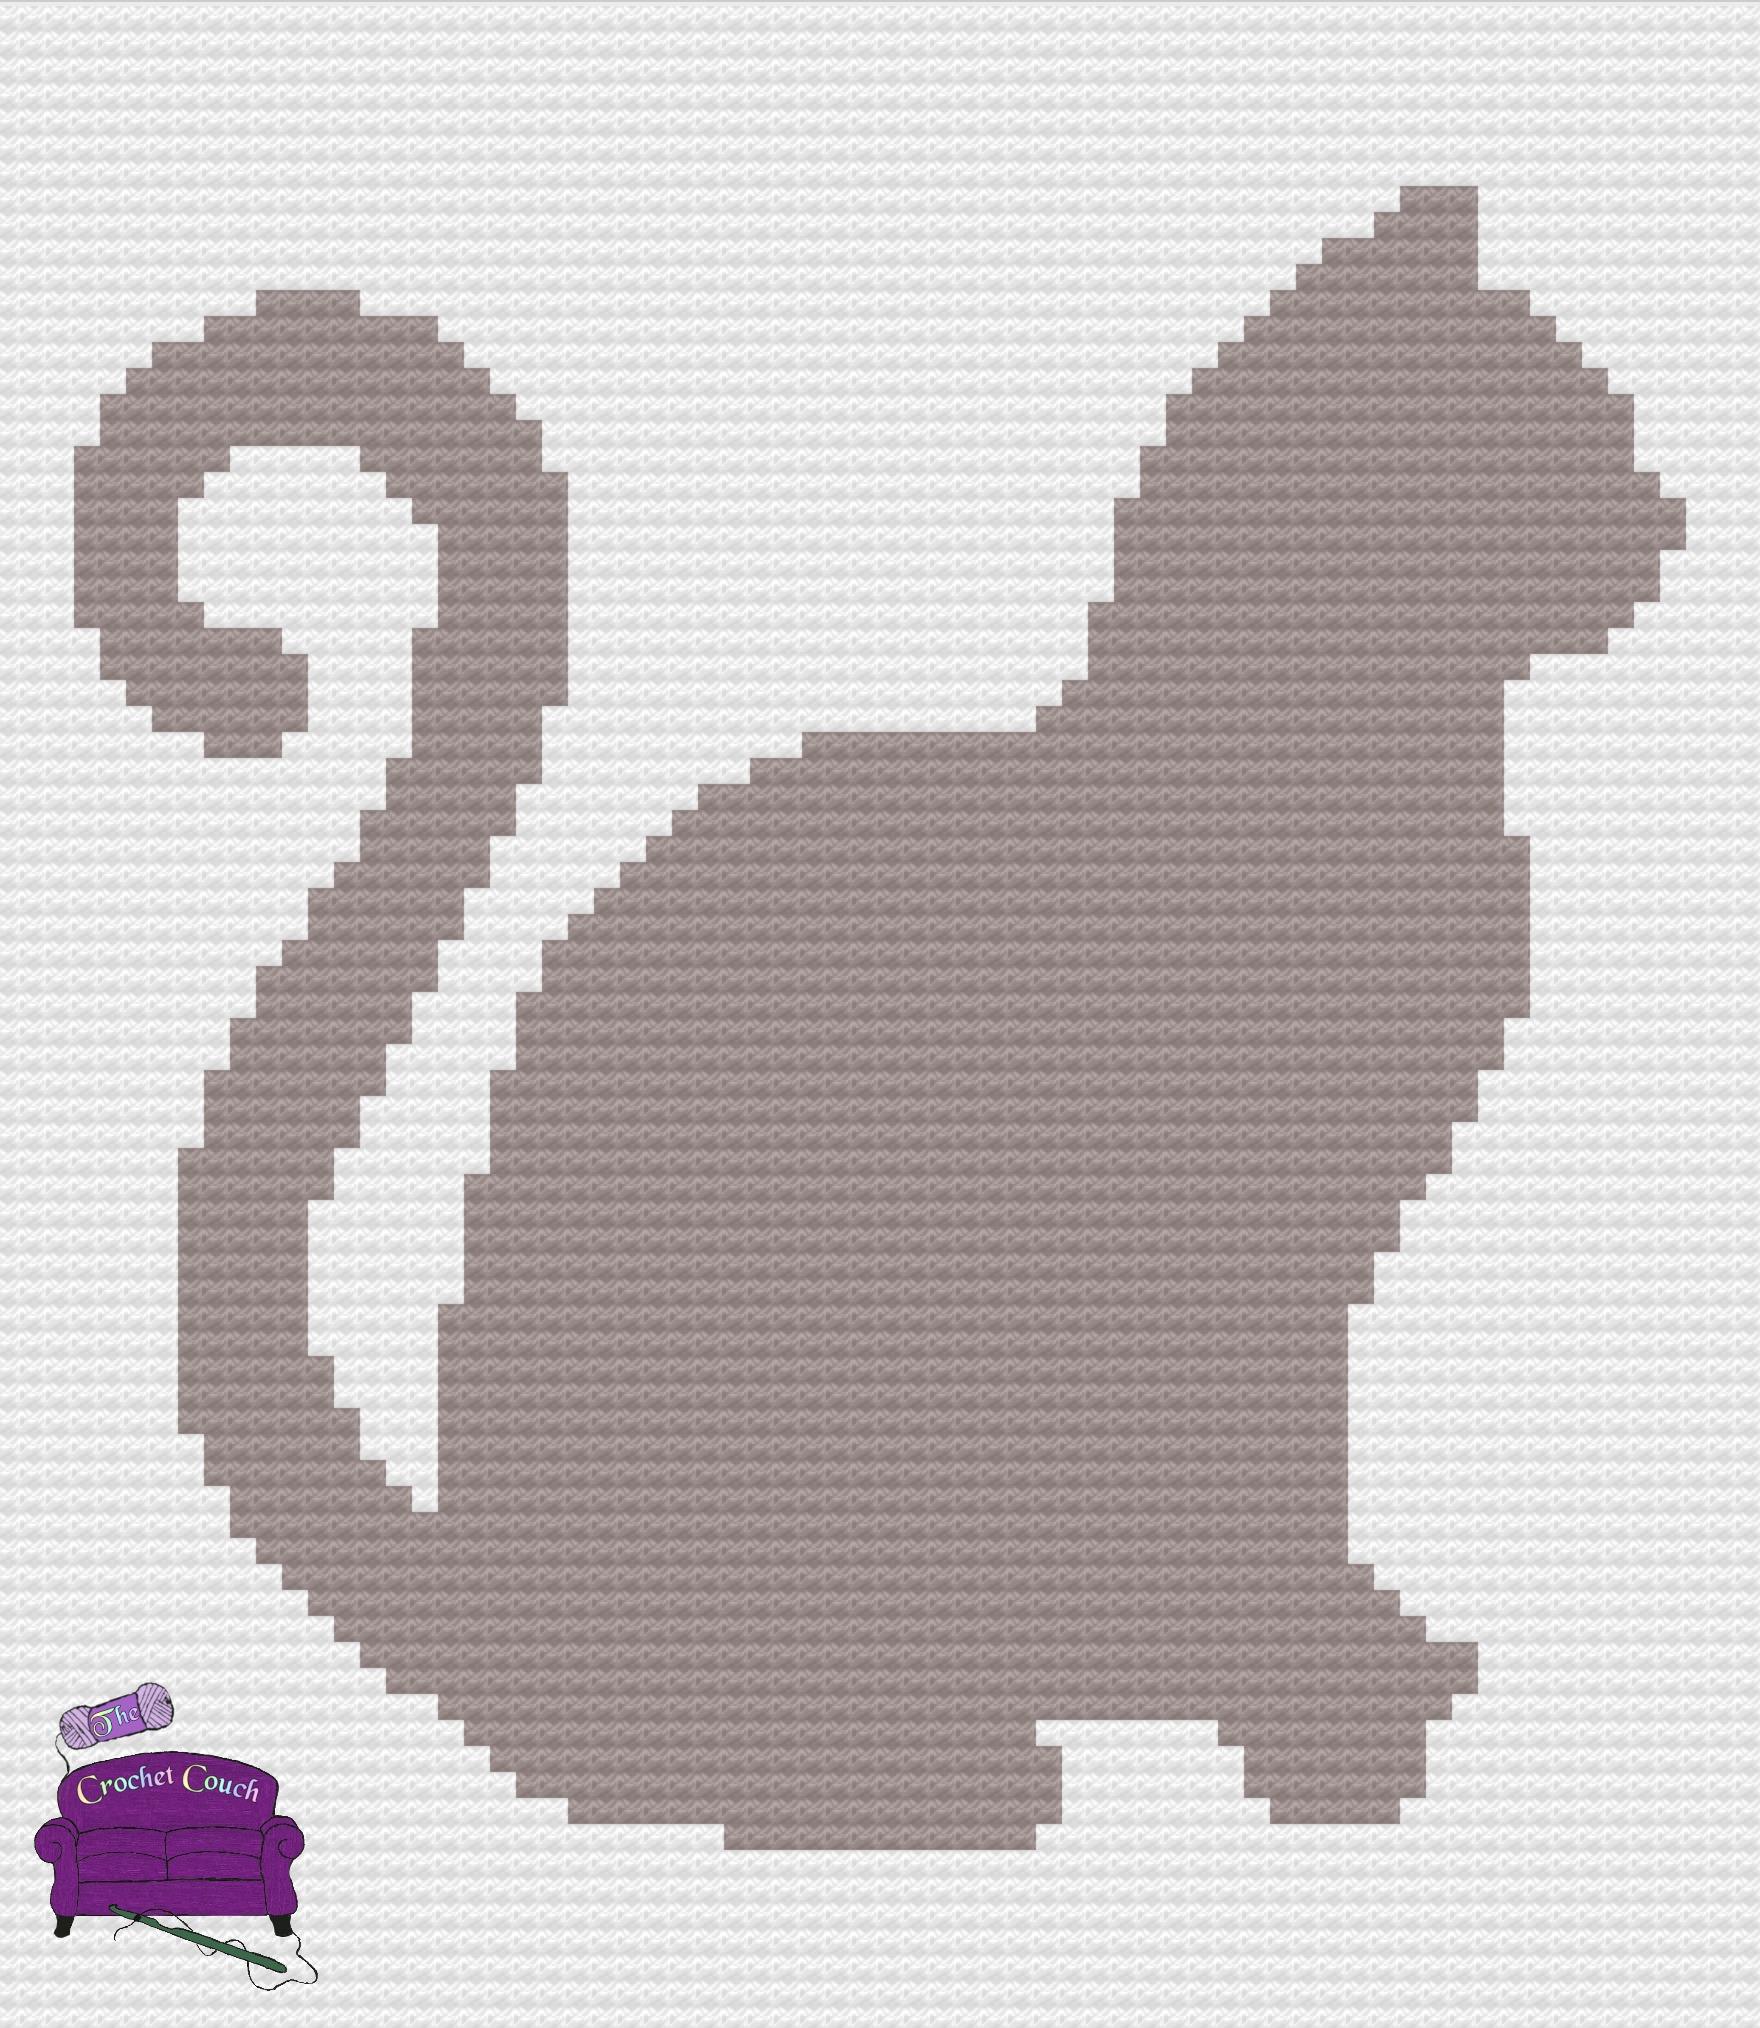 CAT CATS KITTIES CROCHET AFHGAN CROSS STITCH PATTERN GRAPH CHART ... | 1152x1000